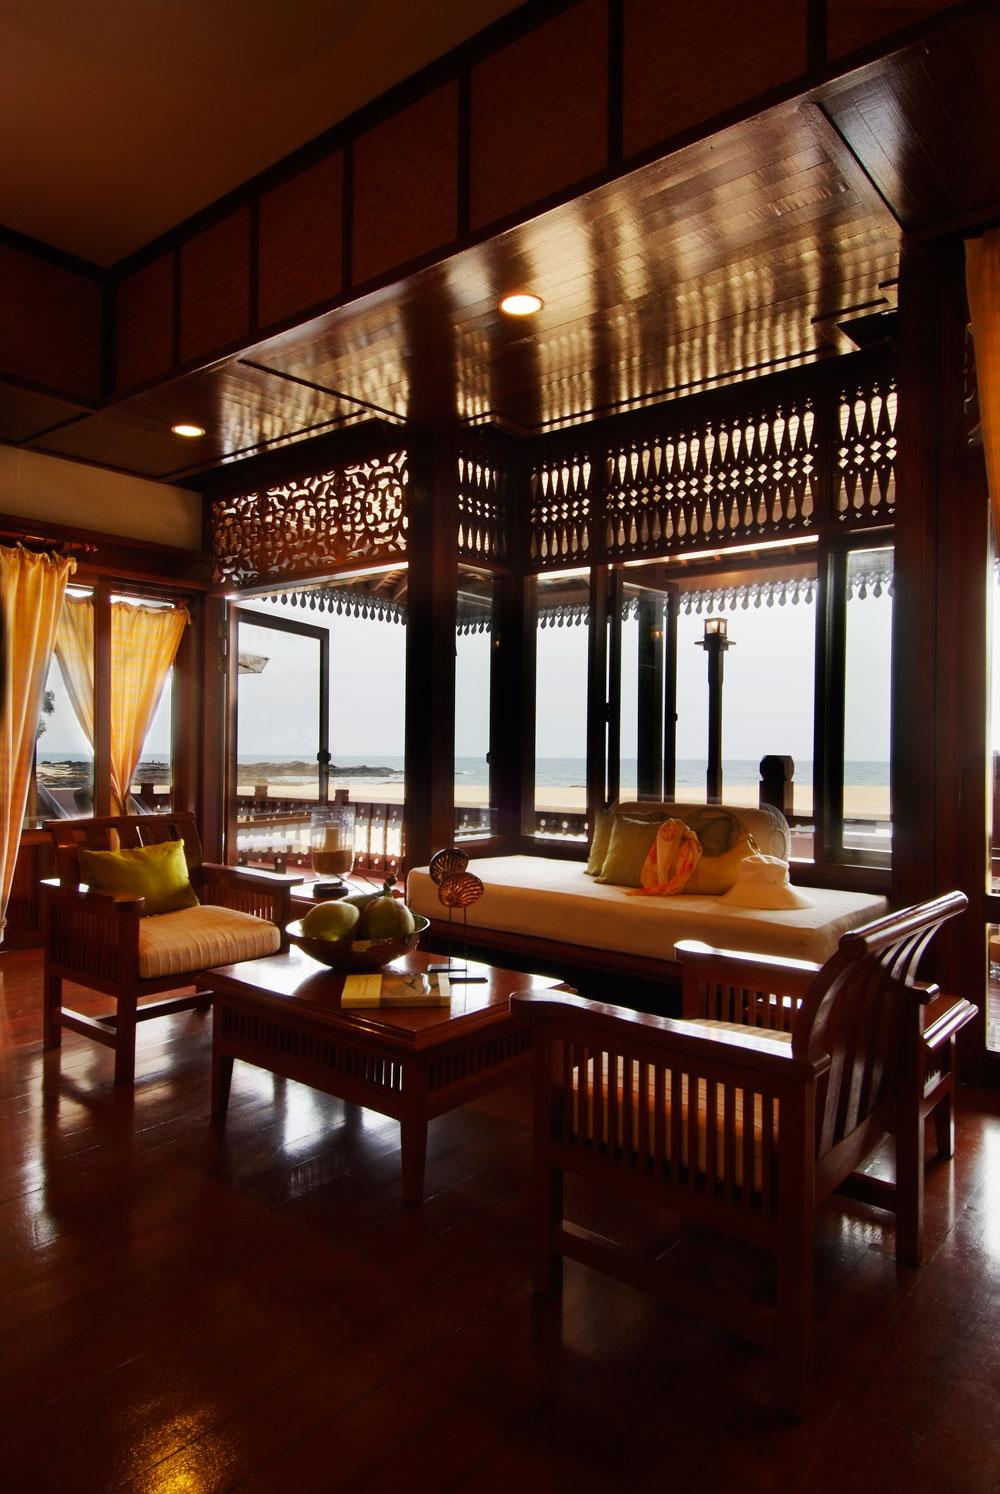 Stunning Resort Architecture Of Tanjong Jara With